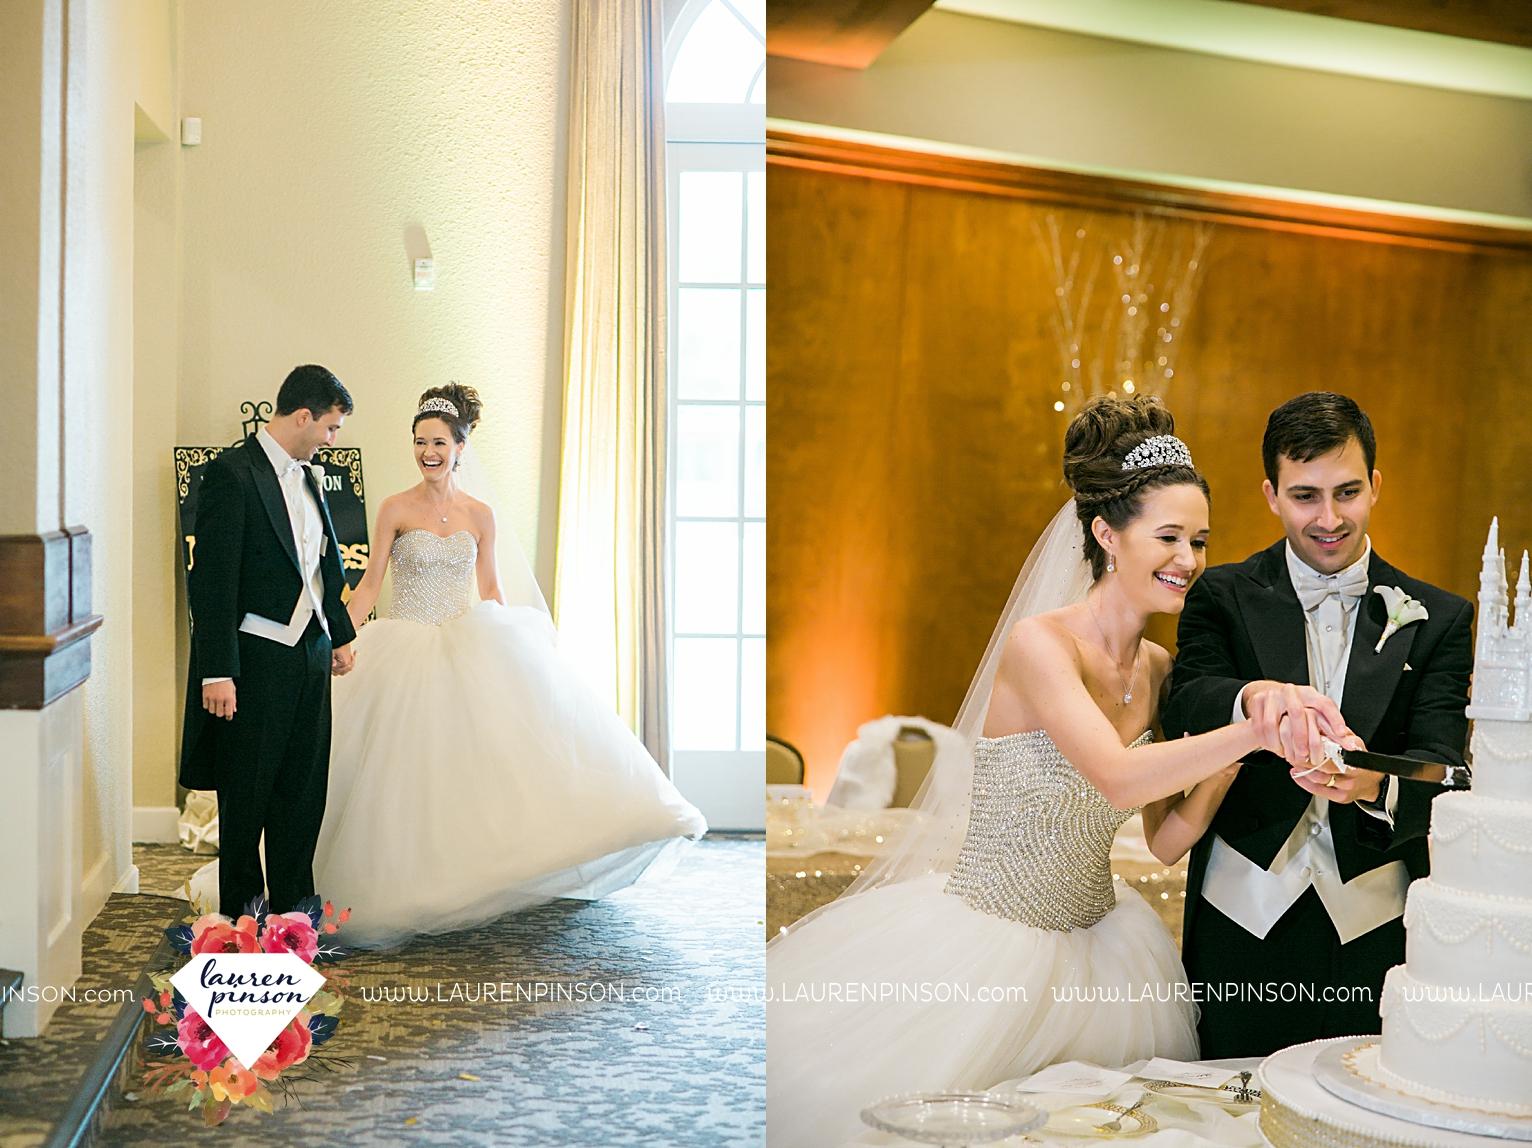 wichita-falls-texas-wedding-photographer-the-forum-by-the-kemp-mayfield-events-ulta-gold-glitter_2875.jpg